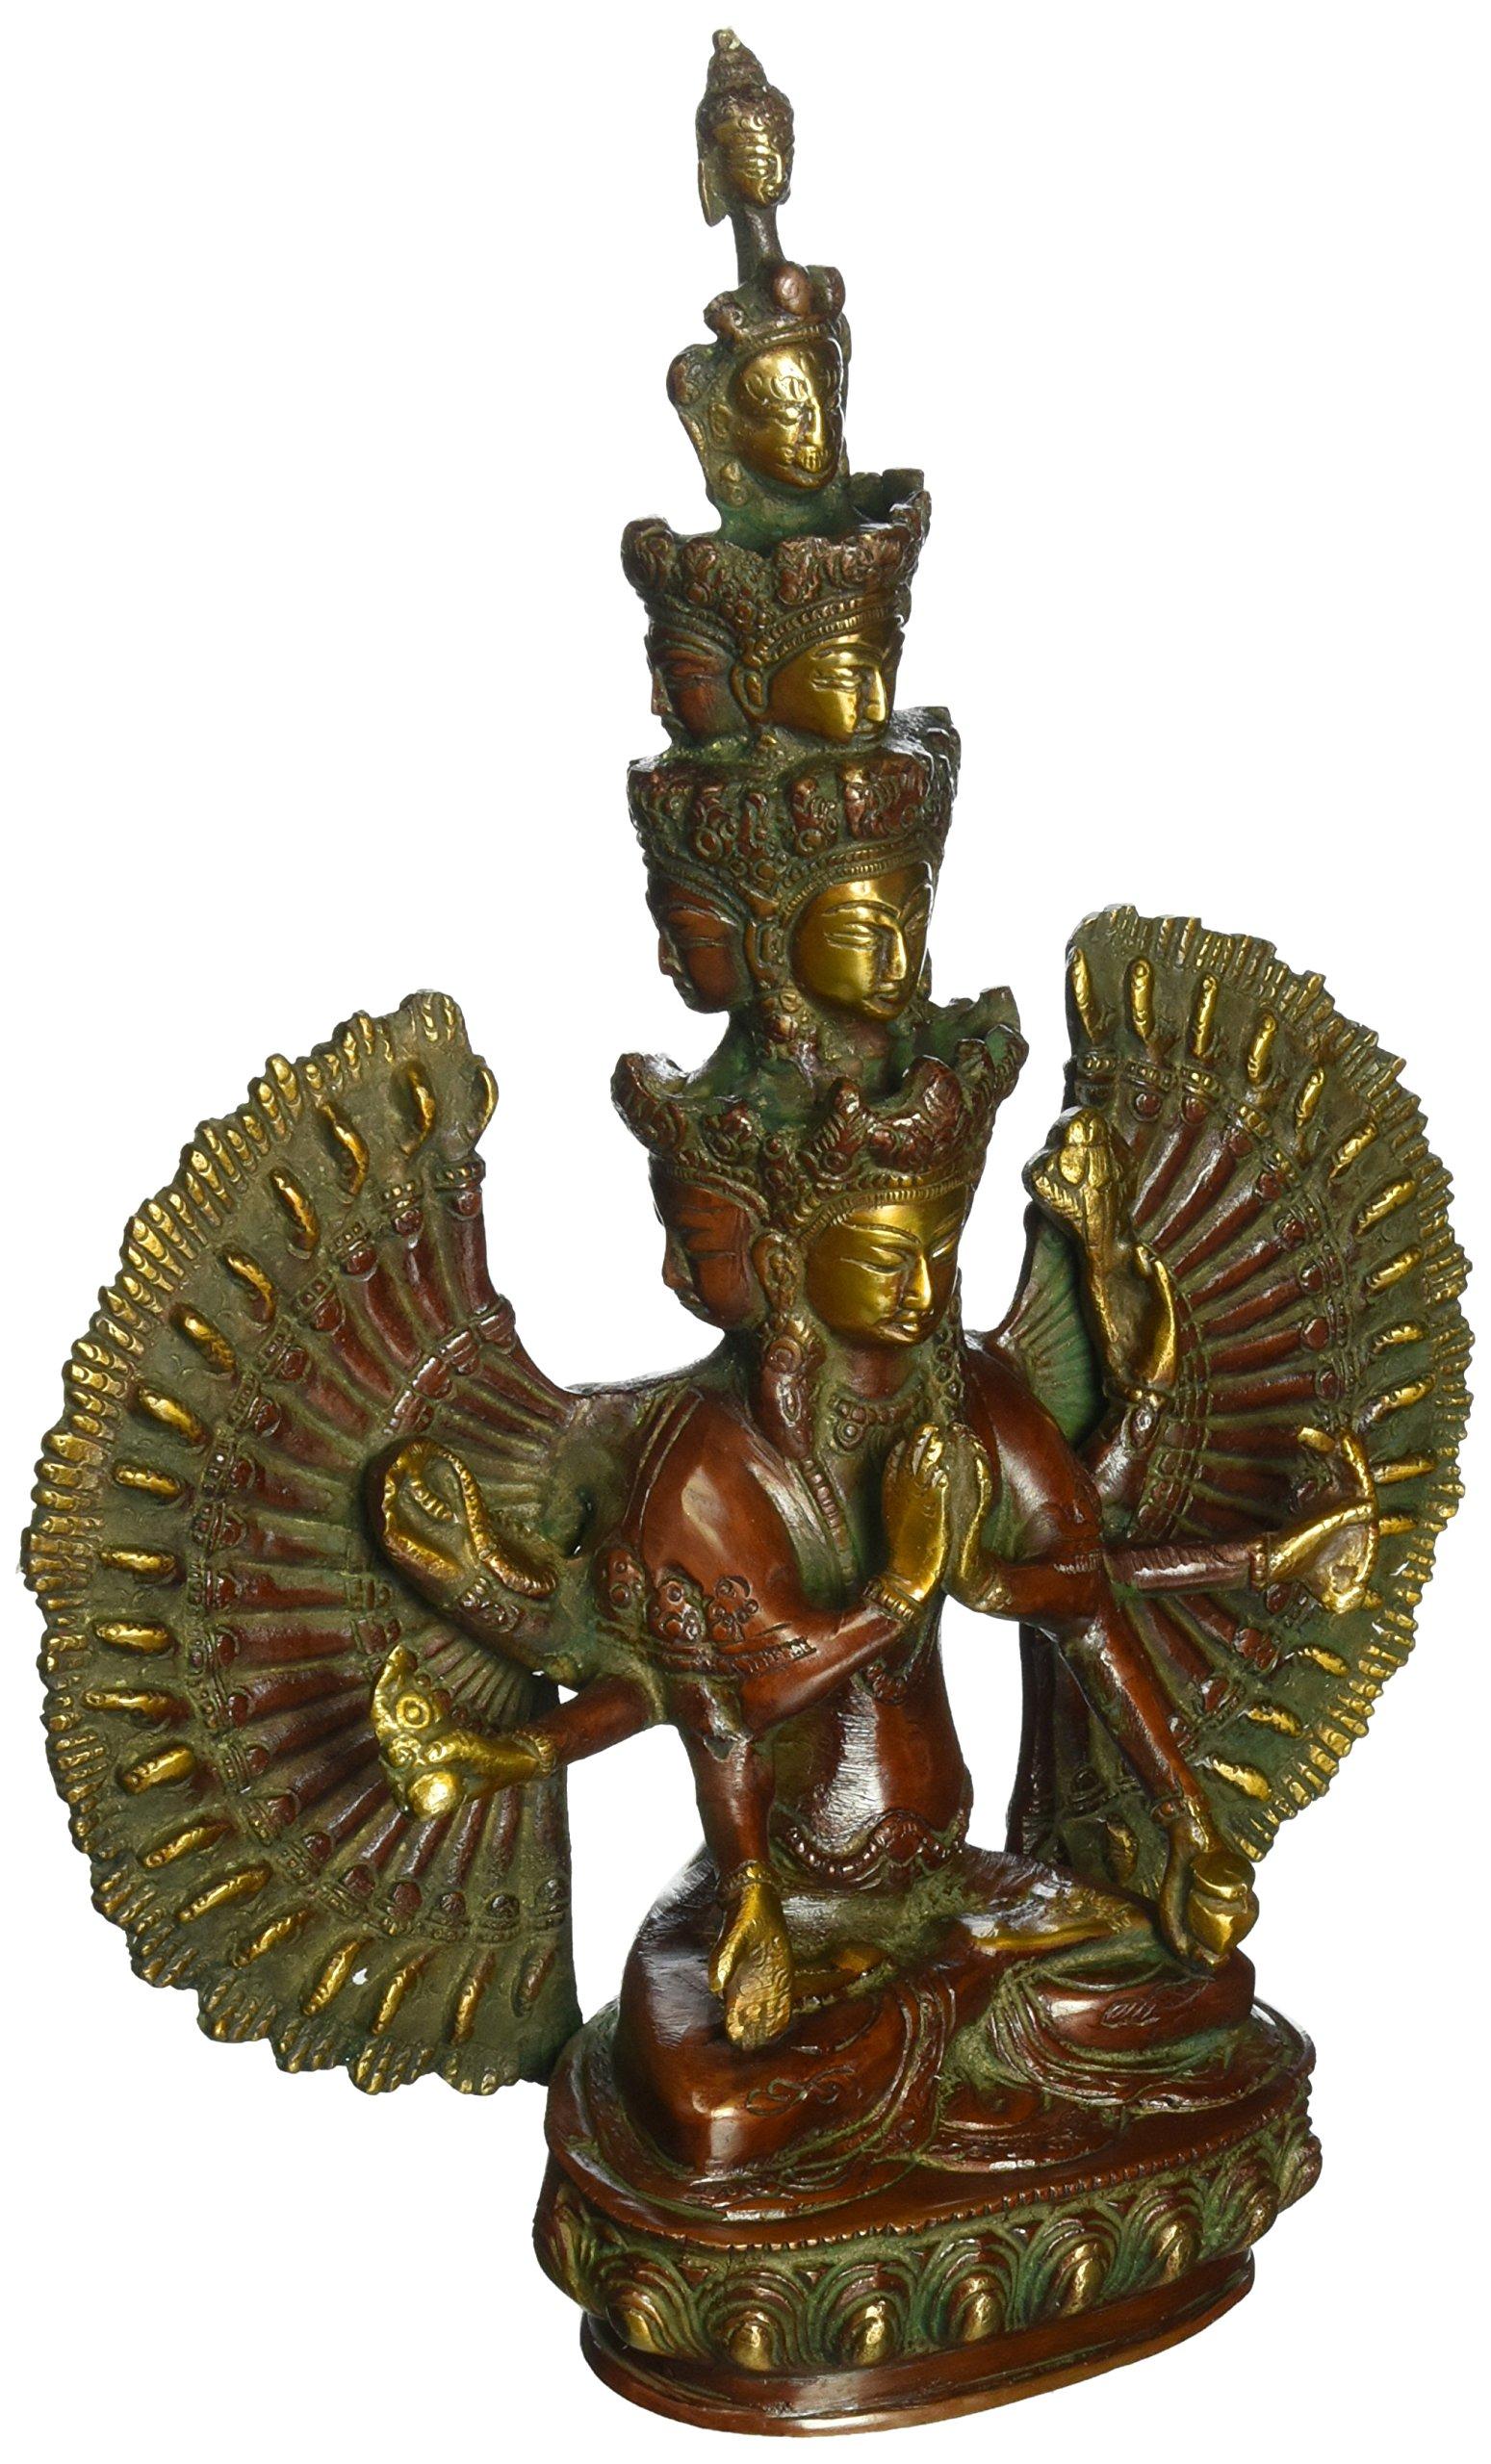 Aone India Large 12 '' 1000 Arms Avalokiteshvara Buddha Statue Goddess Guan Yin Nepal Brass Sculpture + Cash Envelope (Pack Of 10)